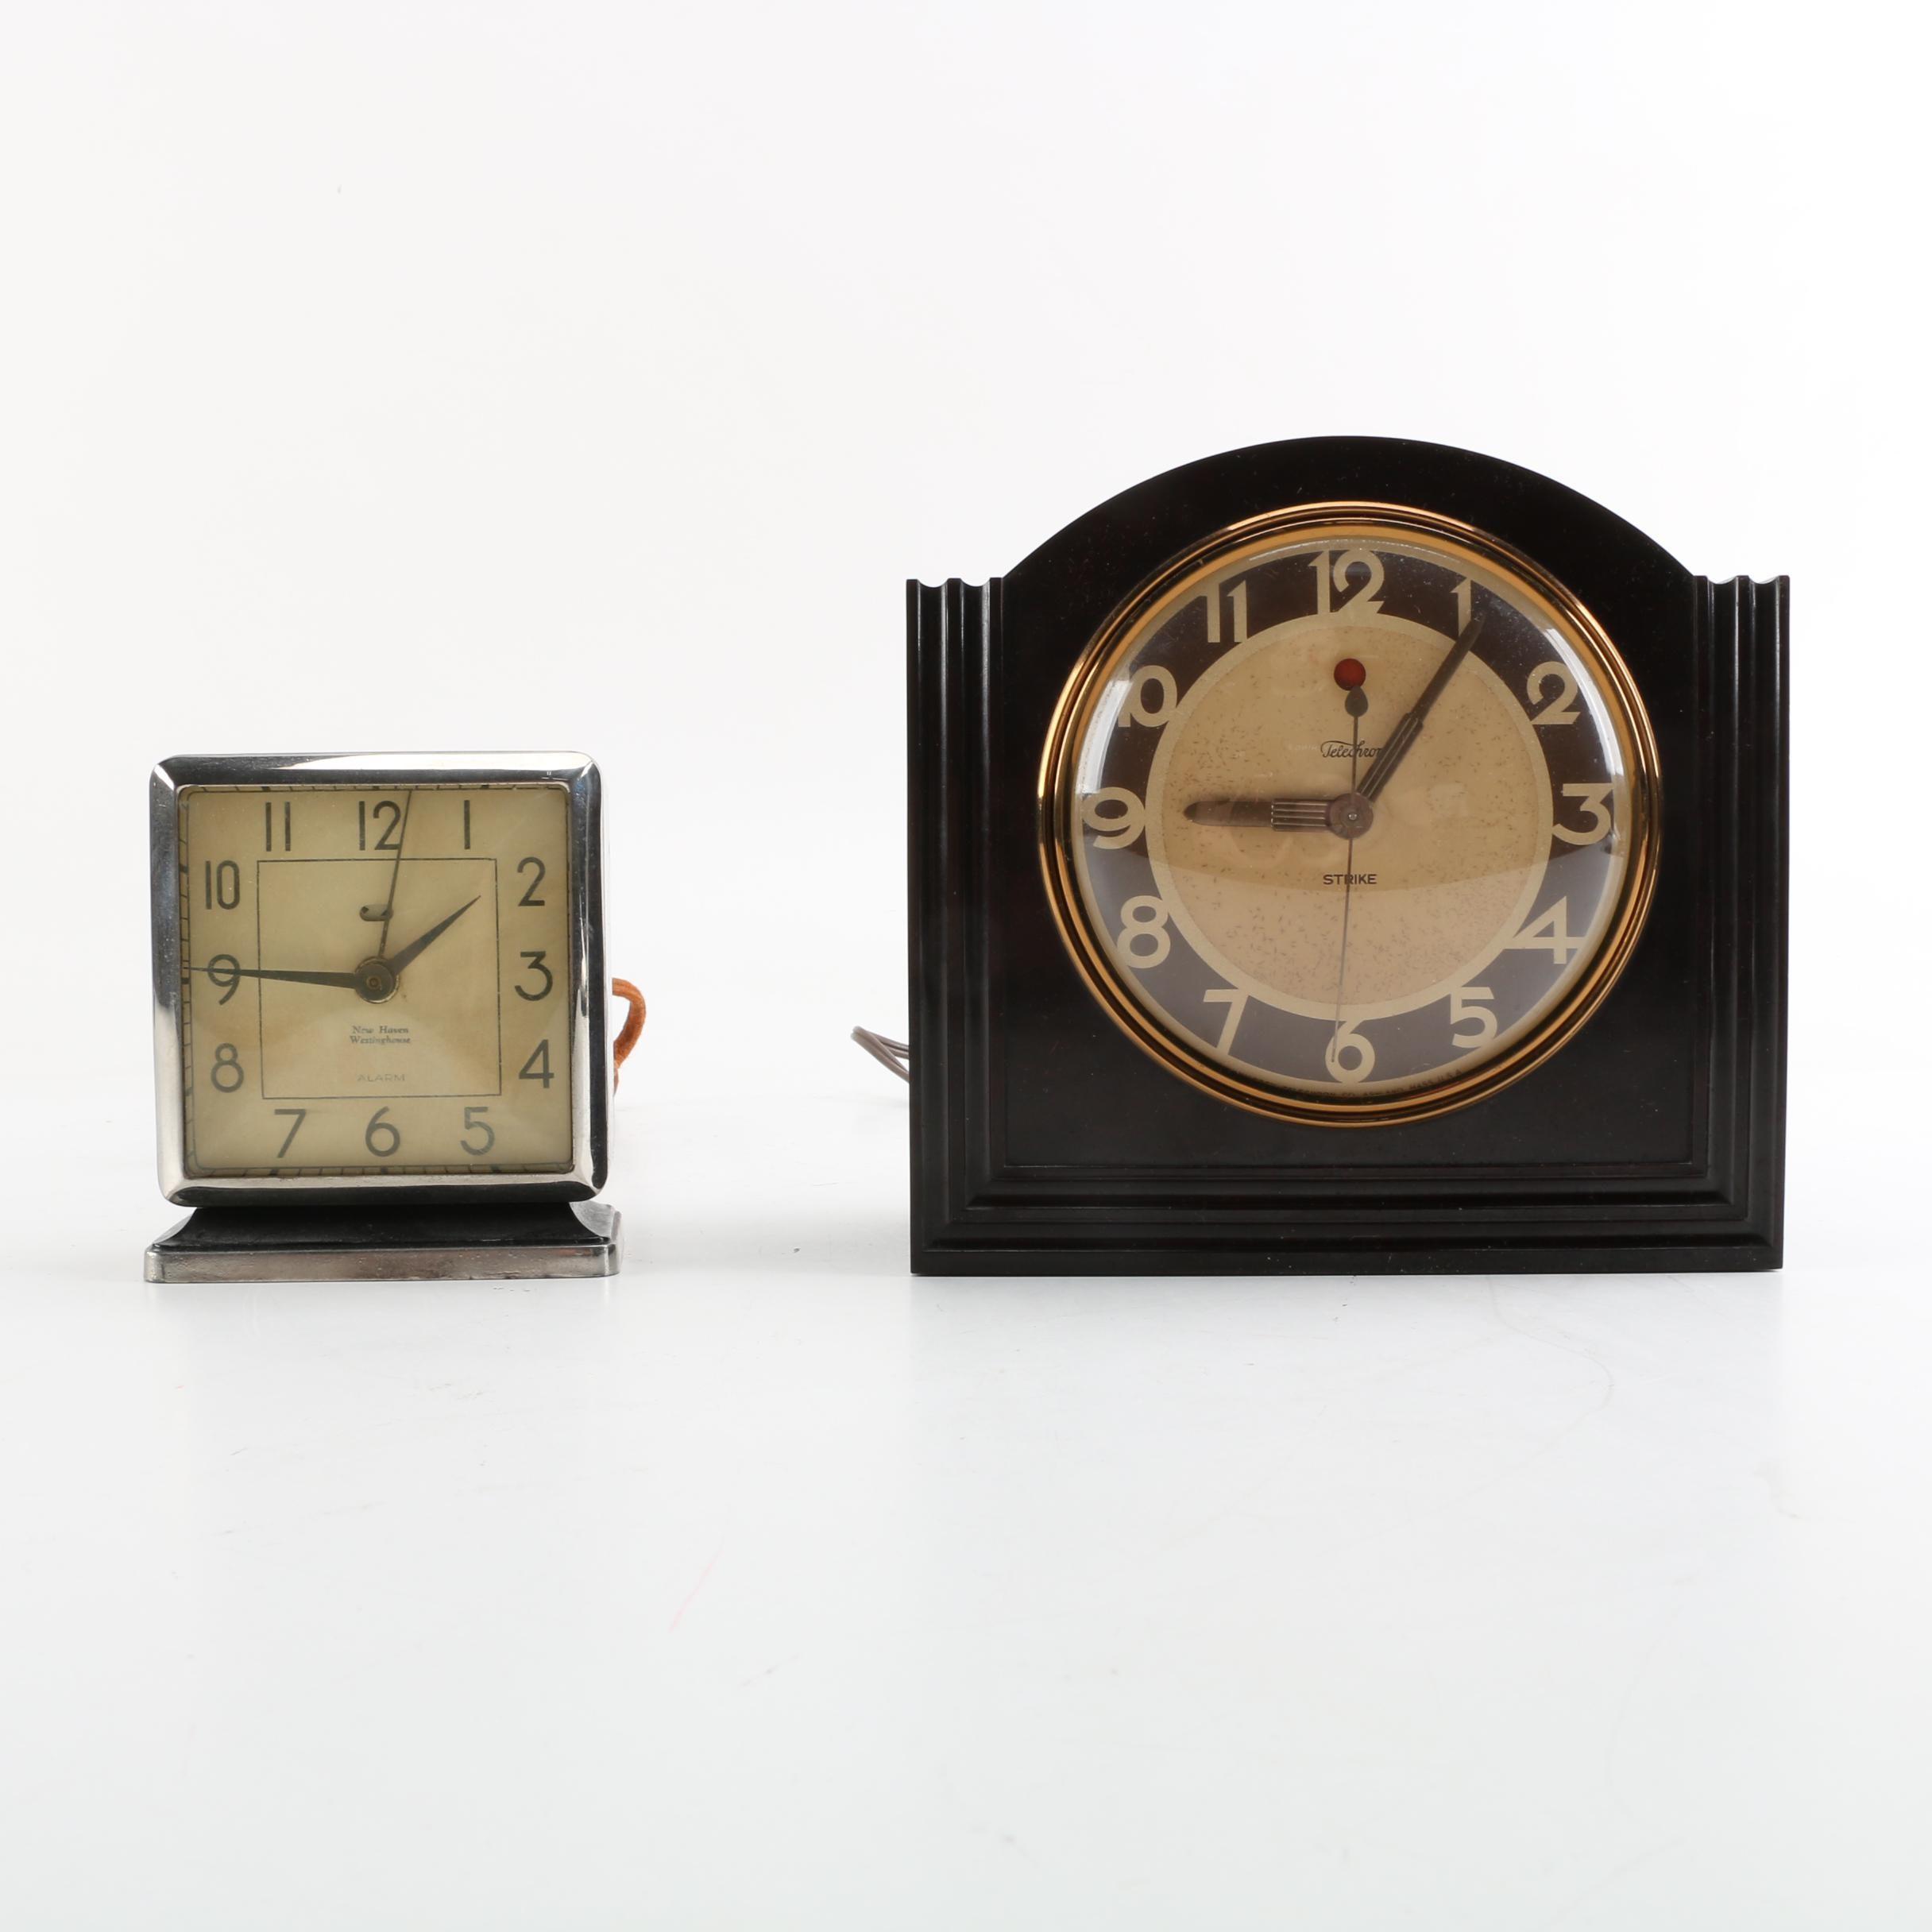 Vintage New Haven and Telechron Art Deco Mantel Clocks